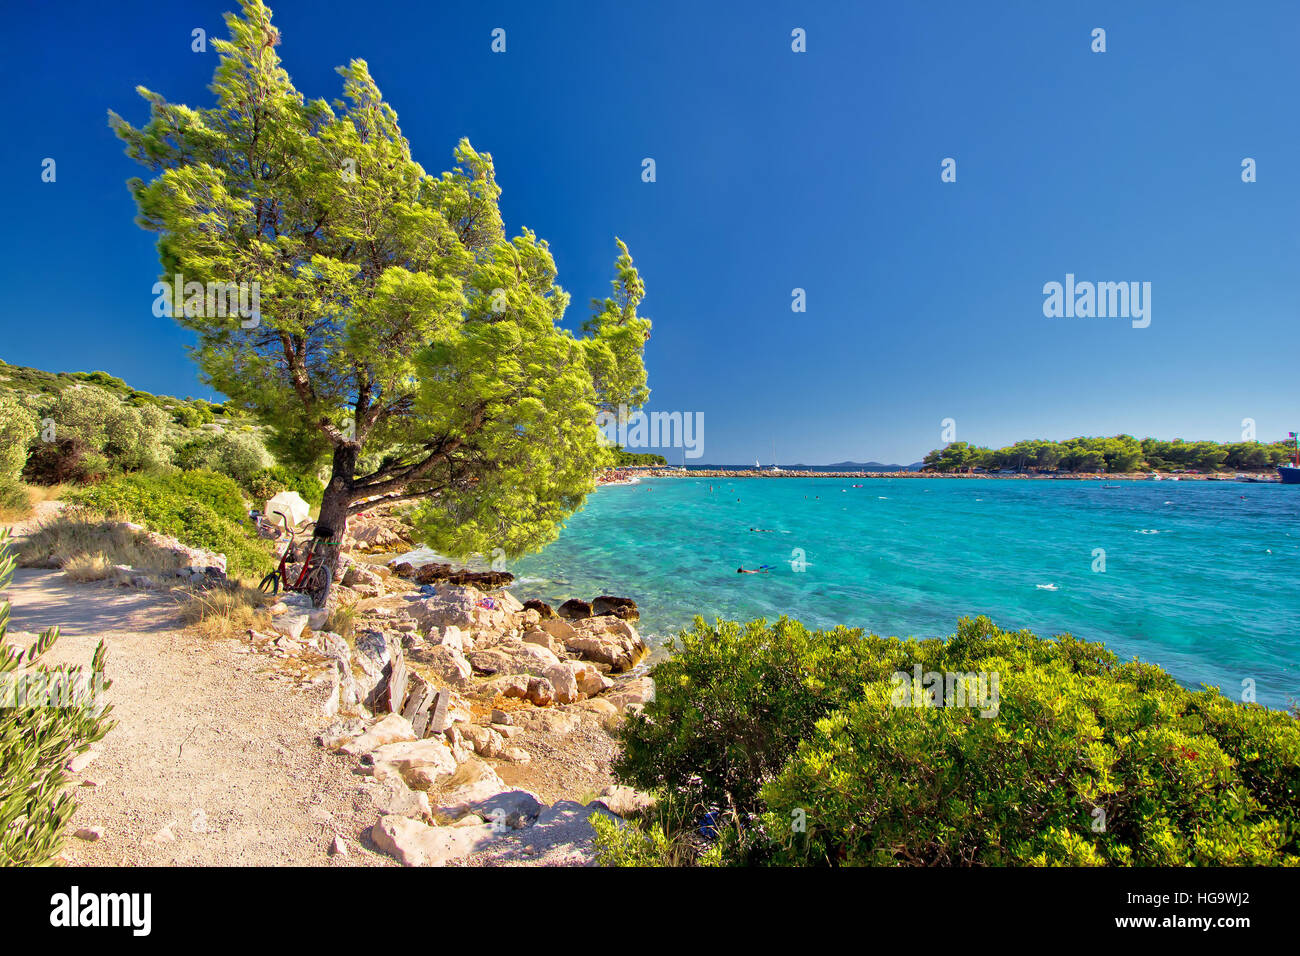 Idílica playa turquesa en Croacia, Dalmacia, Isla de Murter región Imagen De Stock